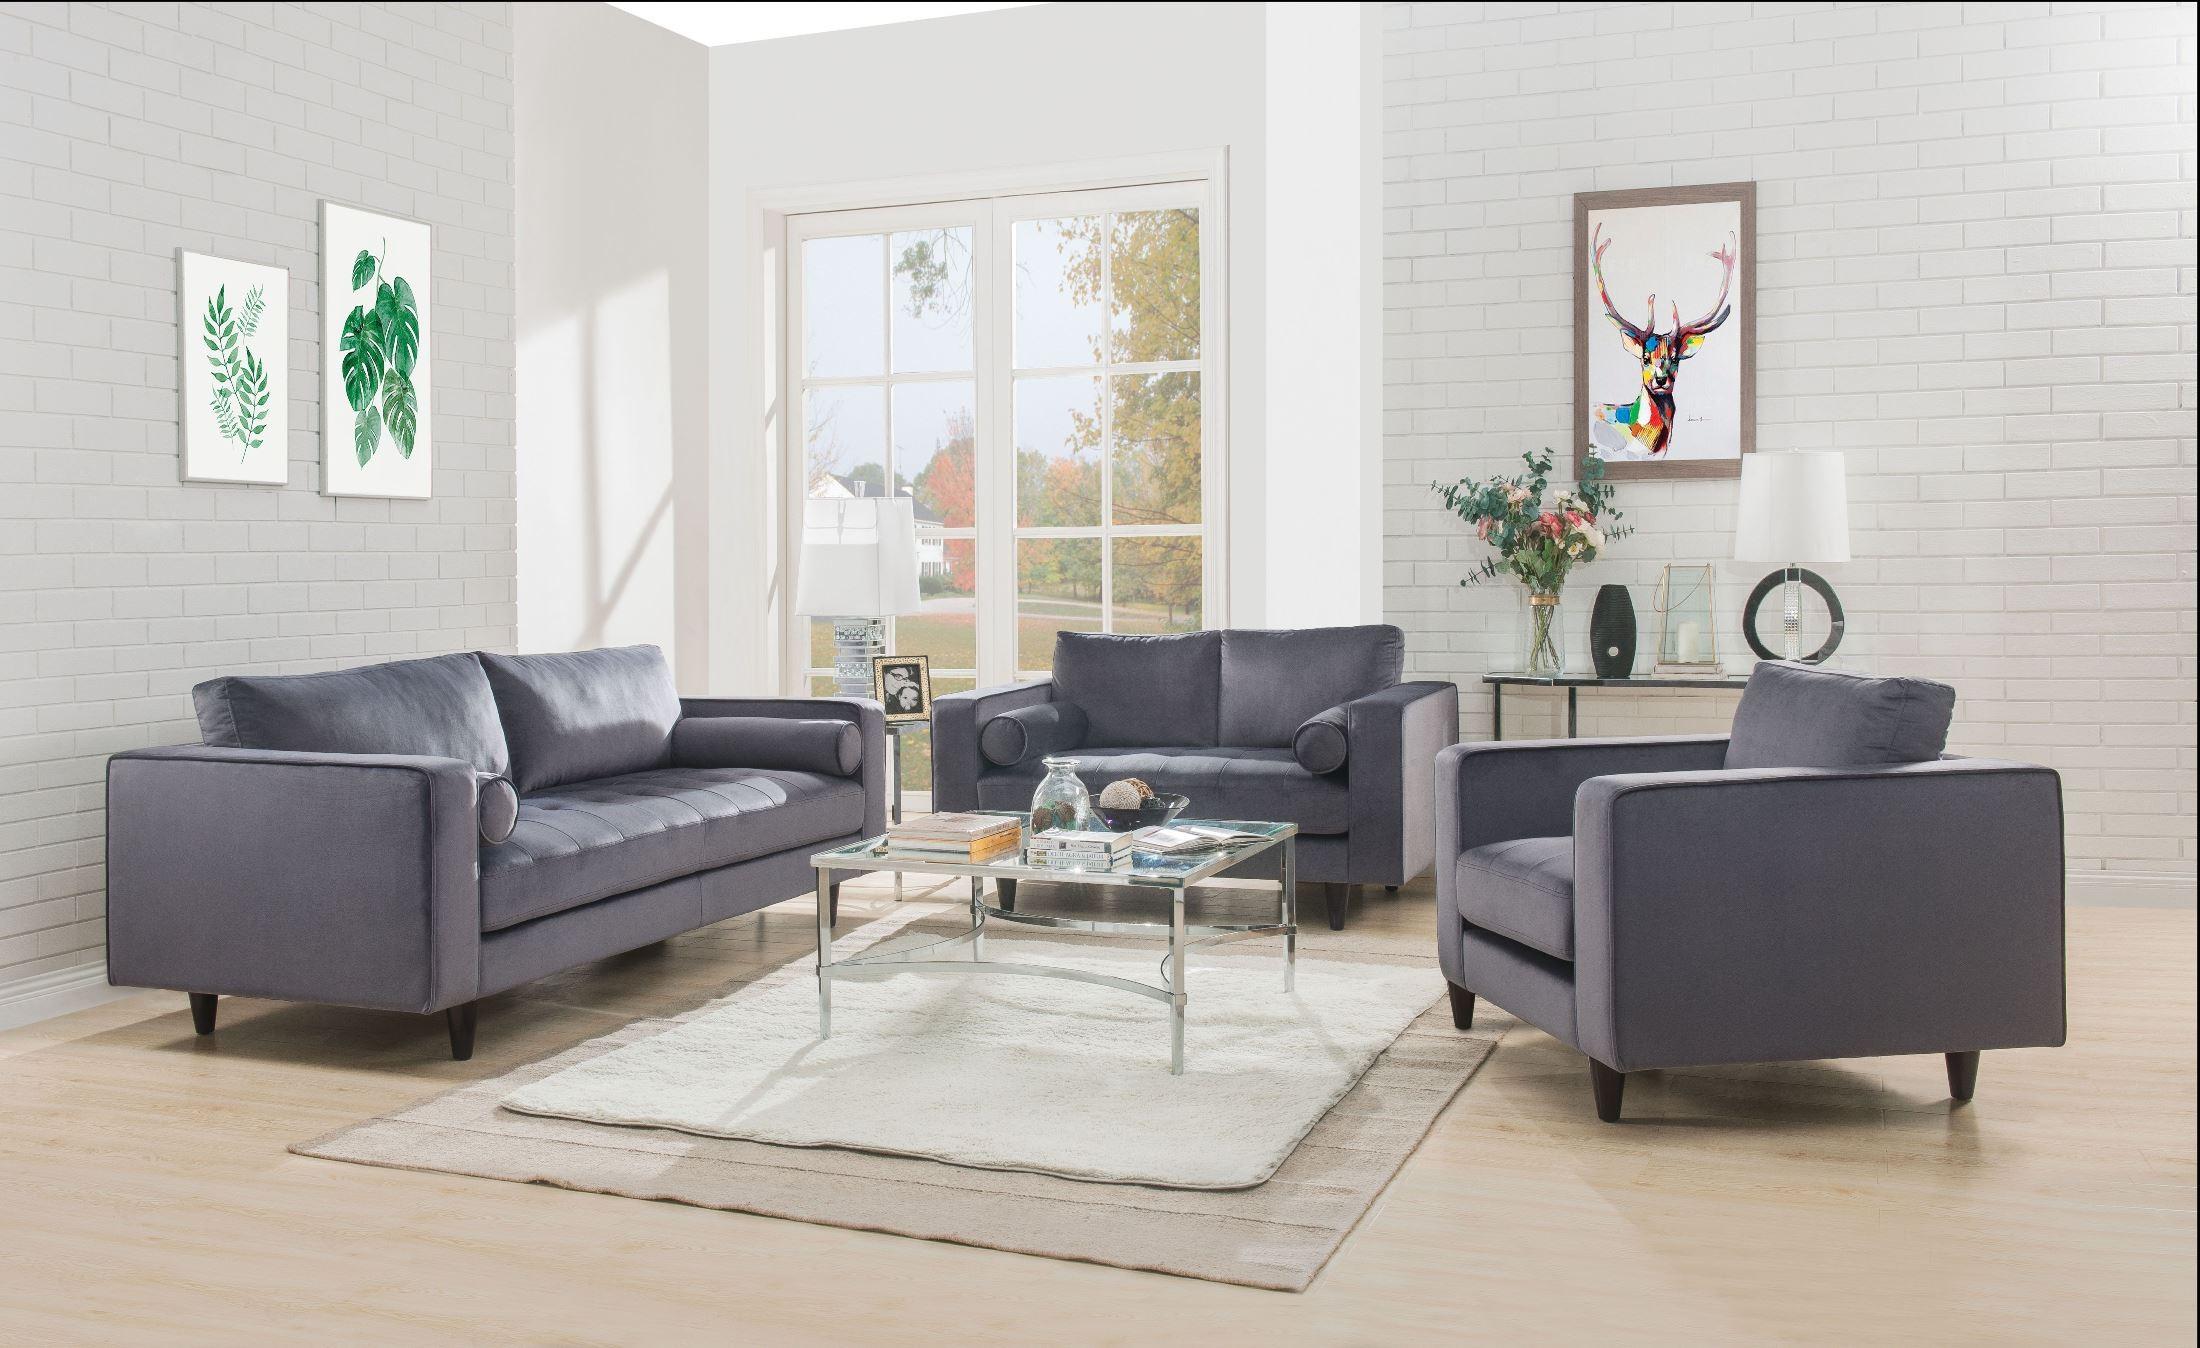 Heather Gray Velvet Living Room Set from ACME Furniture | Coleman ...